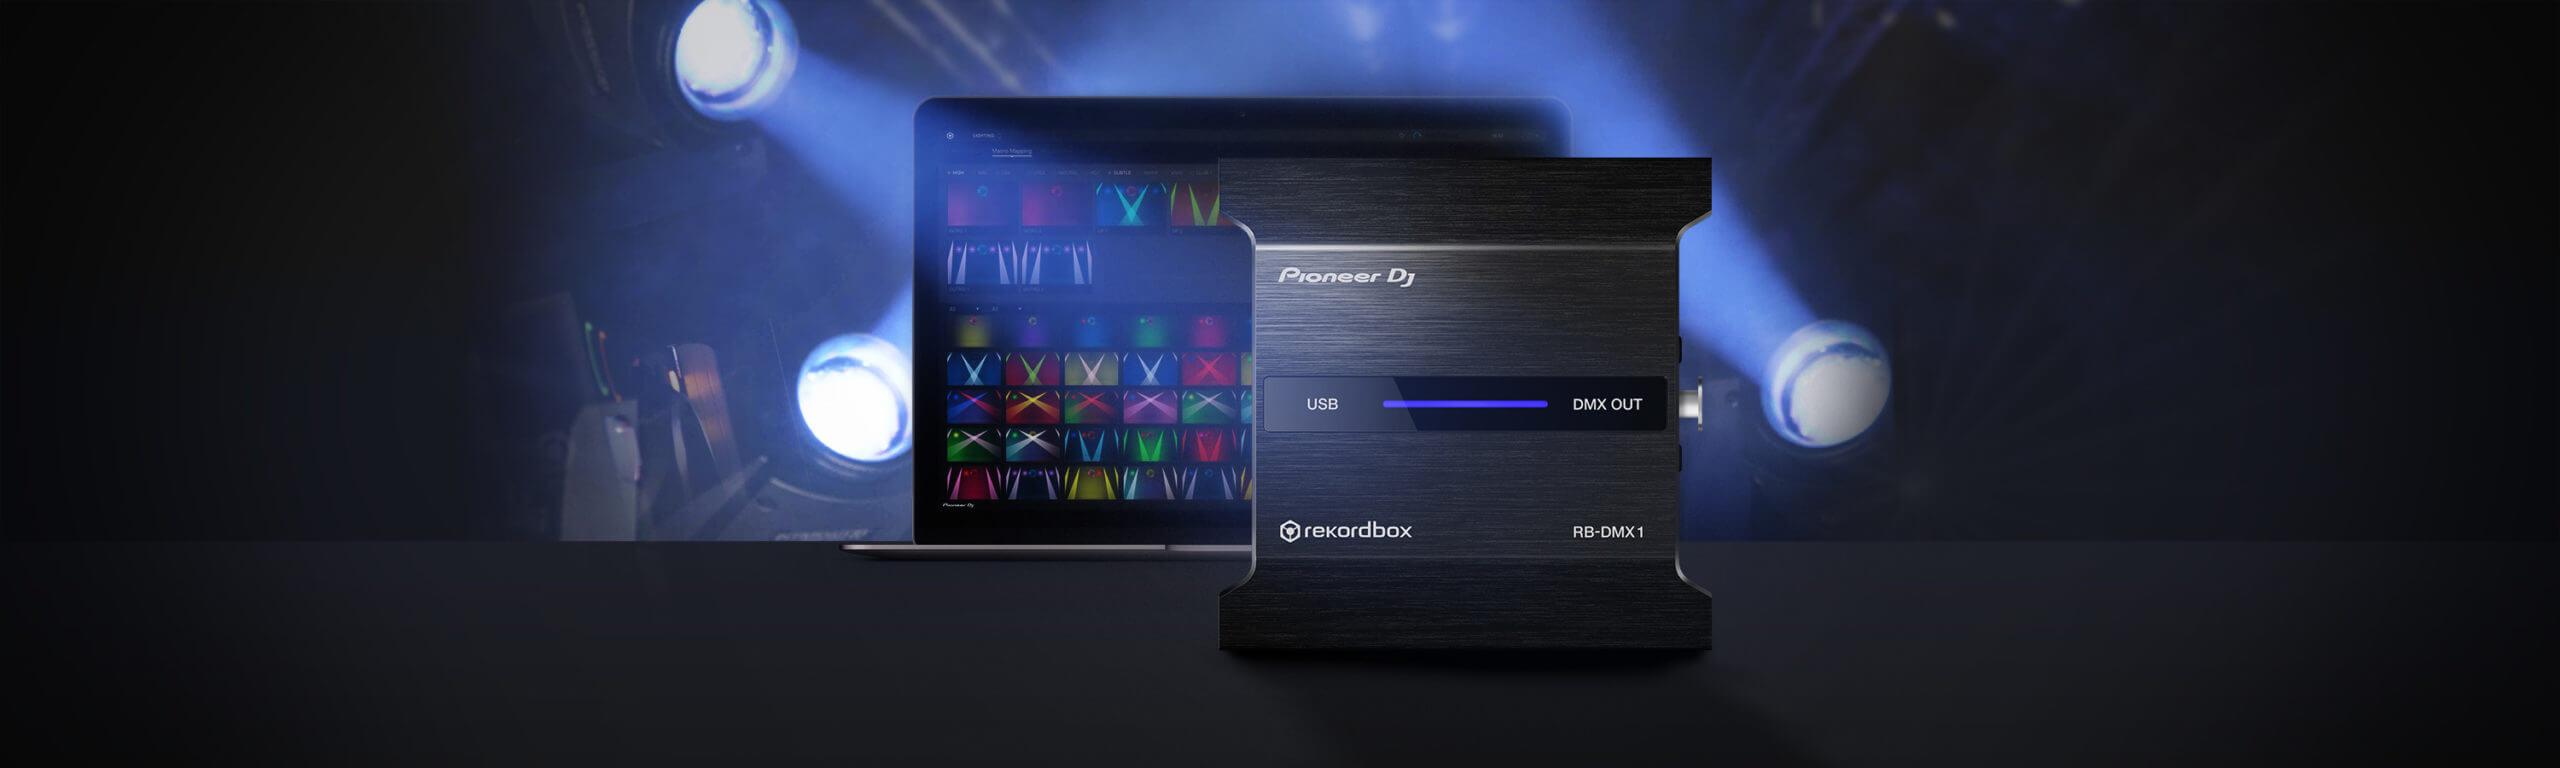 Pioneer DJ's Rekordbox Lighting Interface, the RB-DMX1